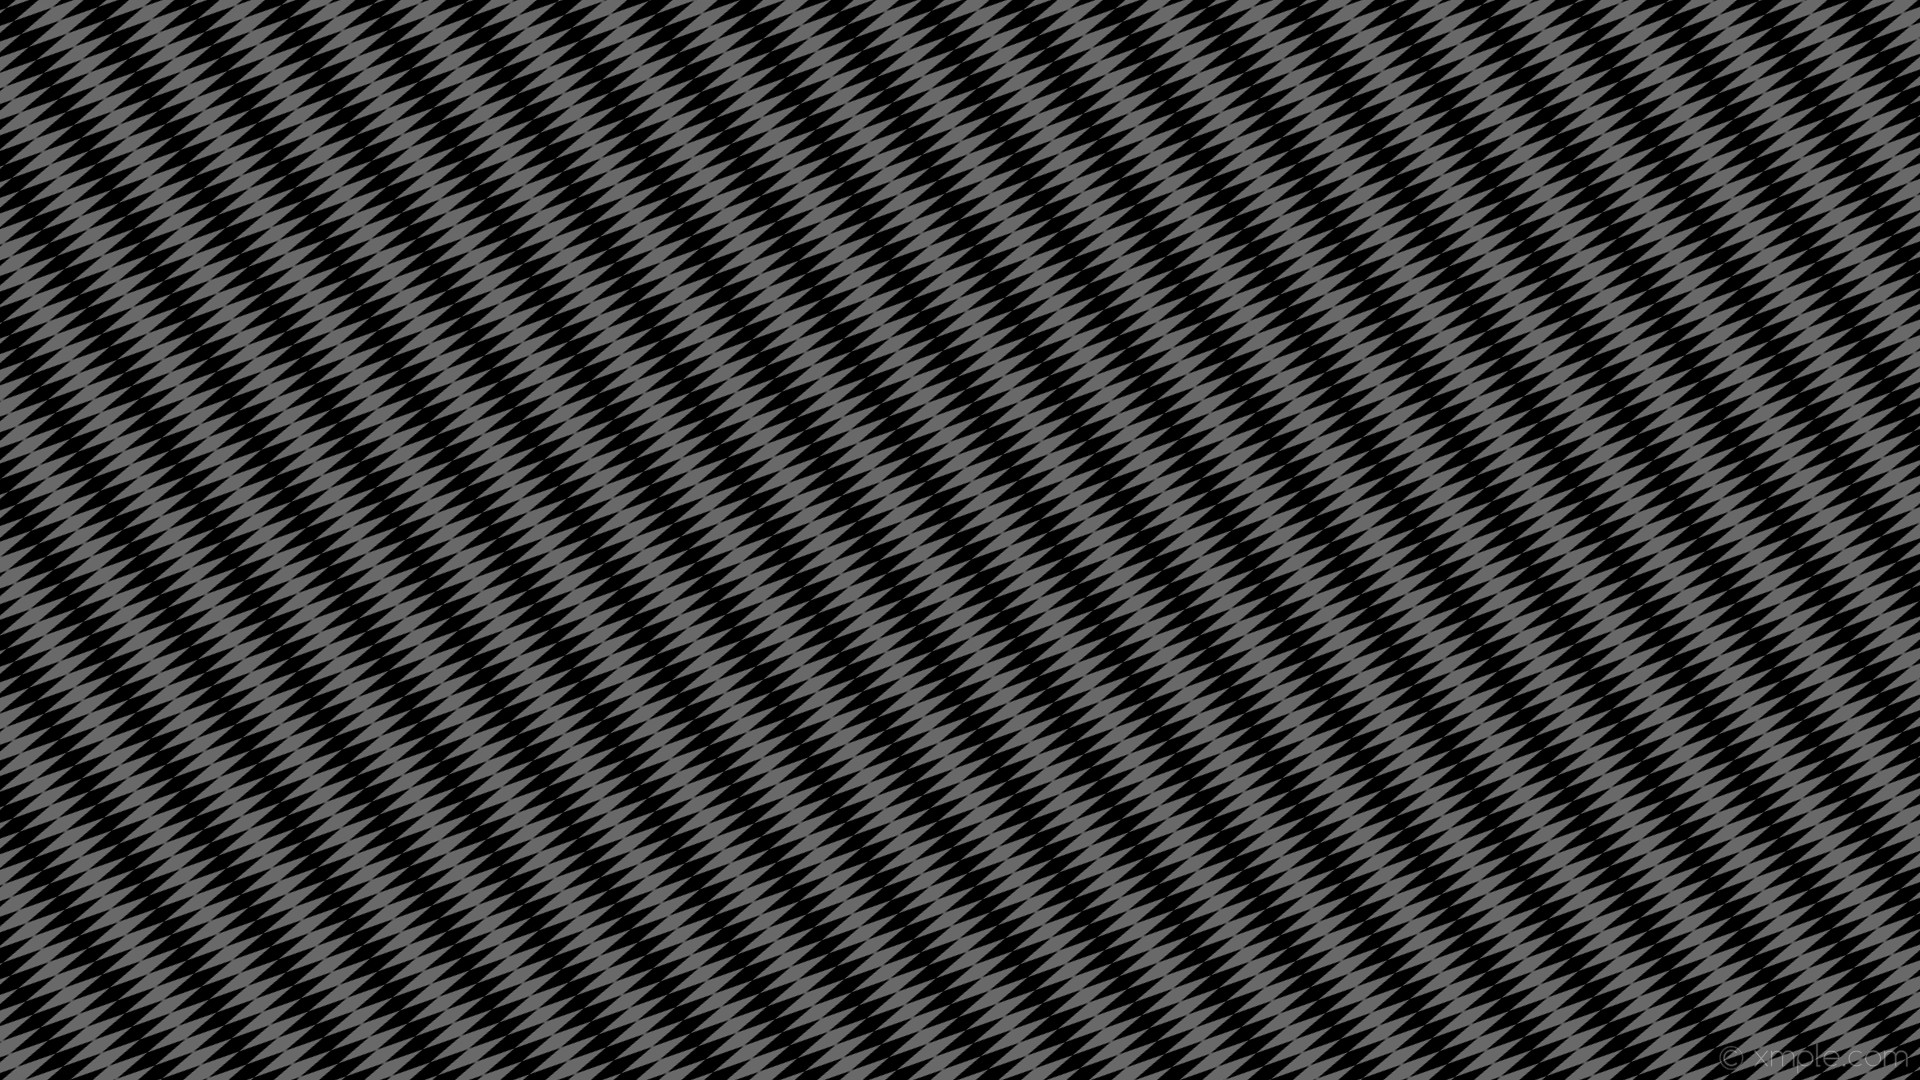 wallpaper rhombus black grey diamond lozenge dim gray #000000 #696969 30°  80px 15px